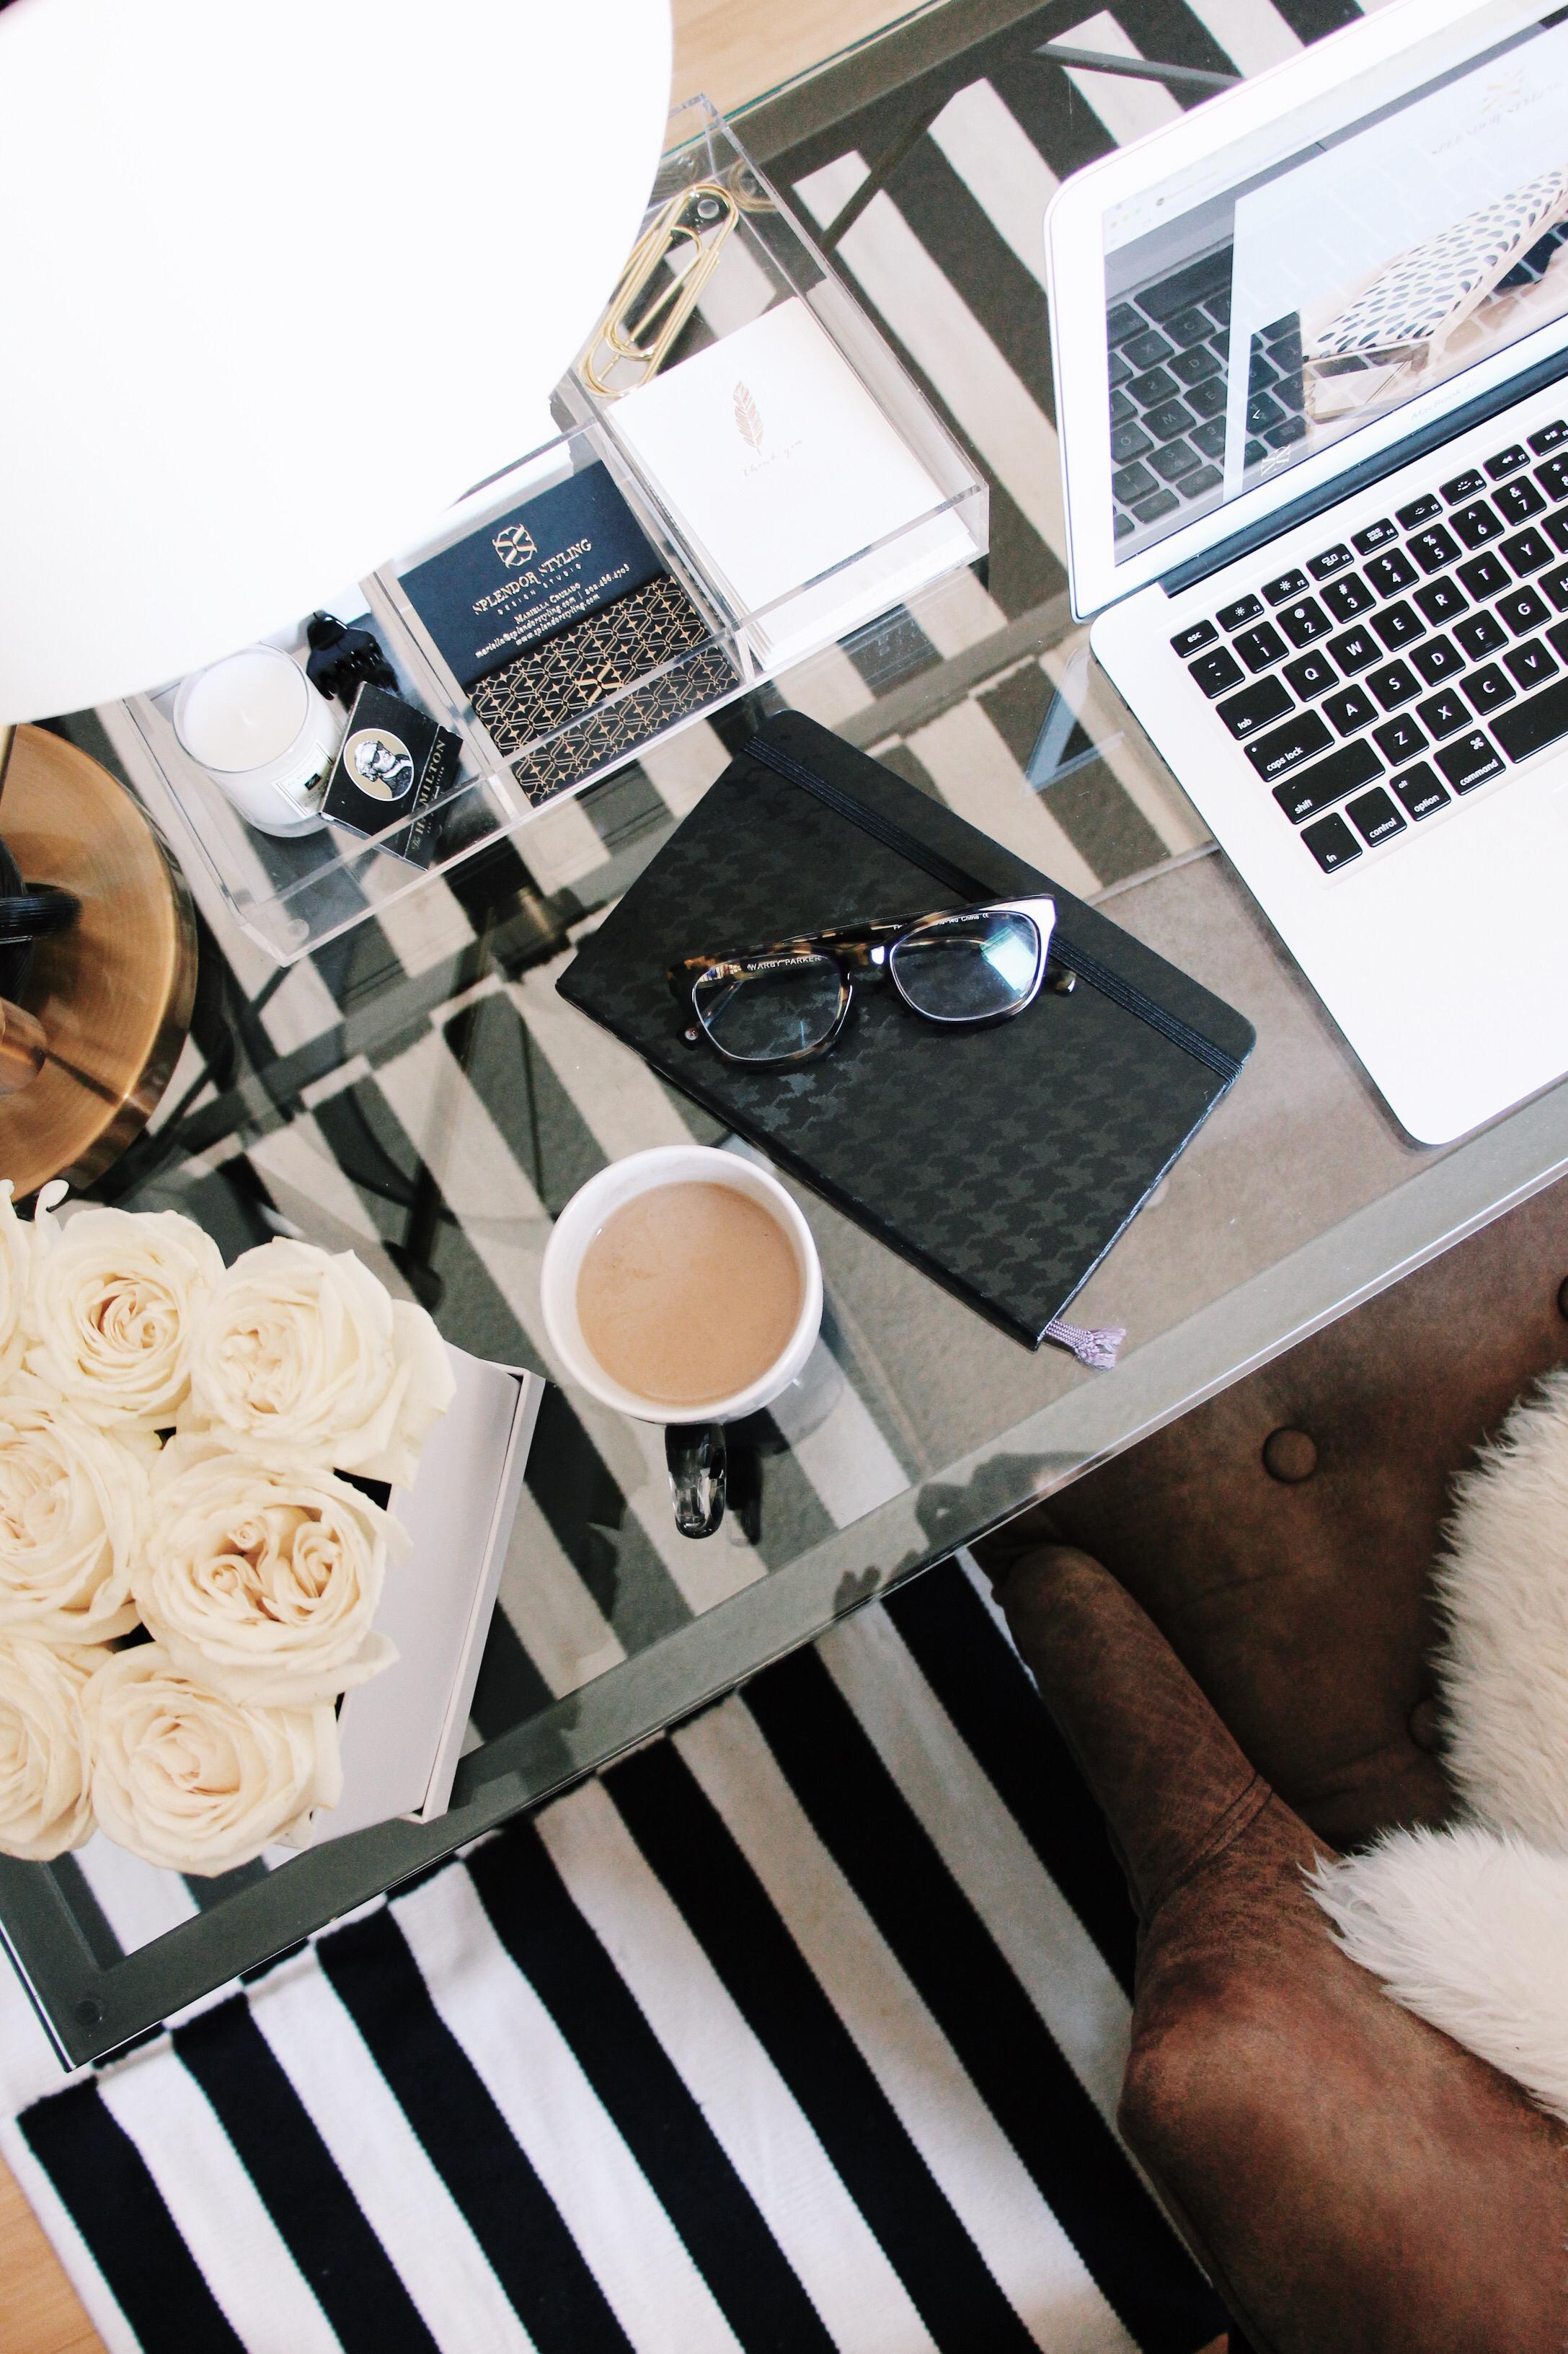 desk-decoration-photography-product-styling-splendor-styling-mariella-cruzado-washington-dc.jpeg